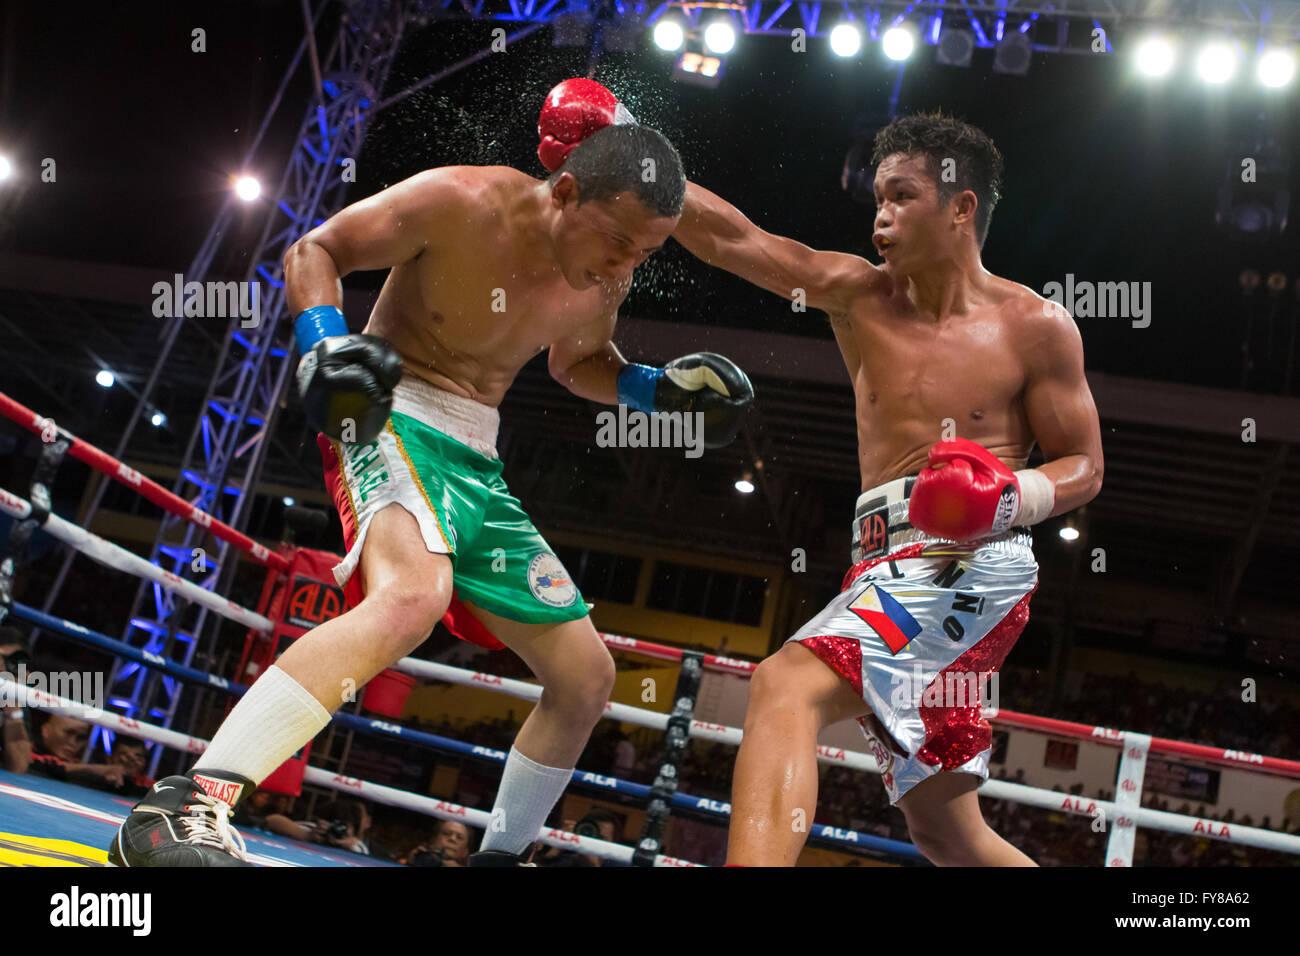 23/4/2016 Cebu City Sports Complex,Cebu City,Philippines.Jason 'El Nino' Pagara vs Miguel Zamudio - Stock Image